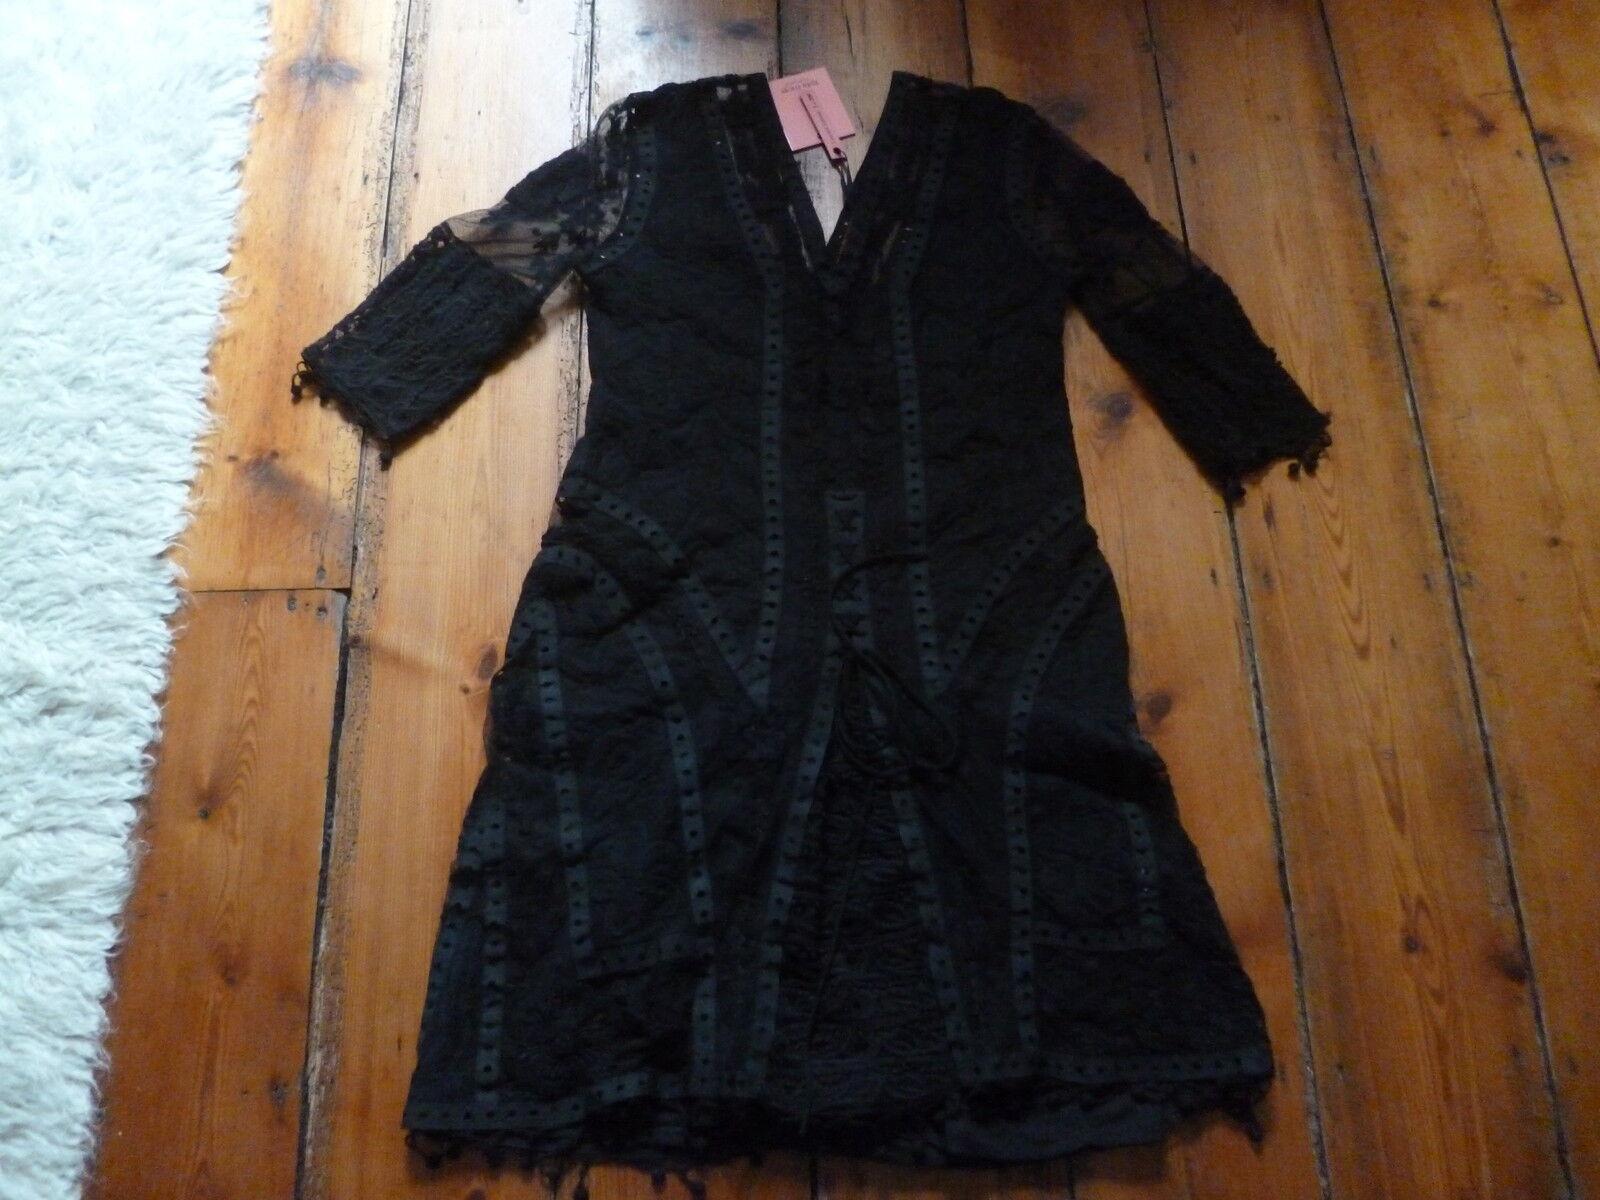 BNWT KATE MOSS schwarz  LACE & CROCHET DRESS 8 TOPSHOP 1 of 200.